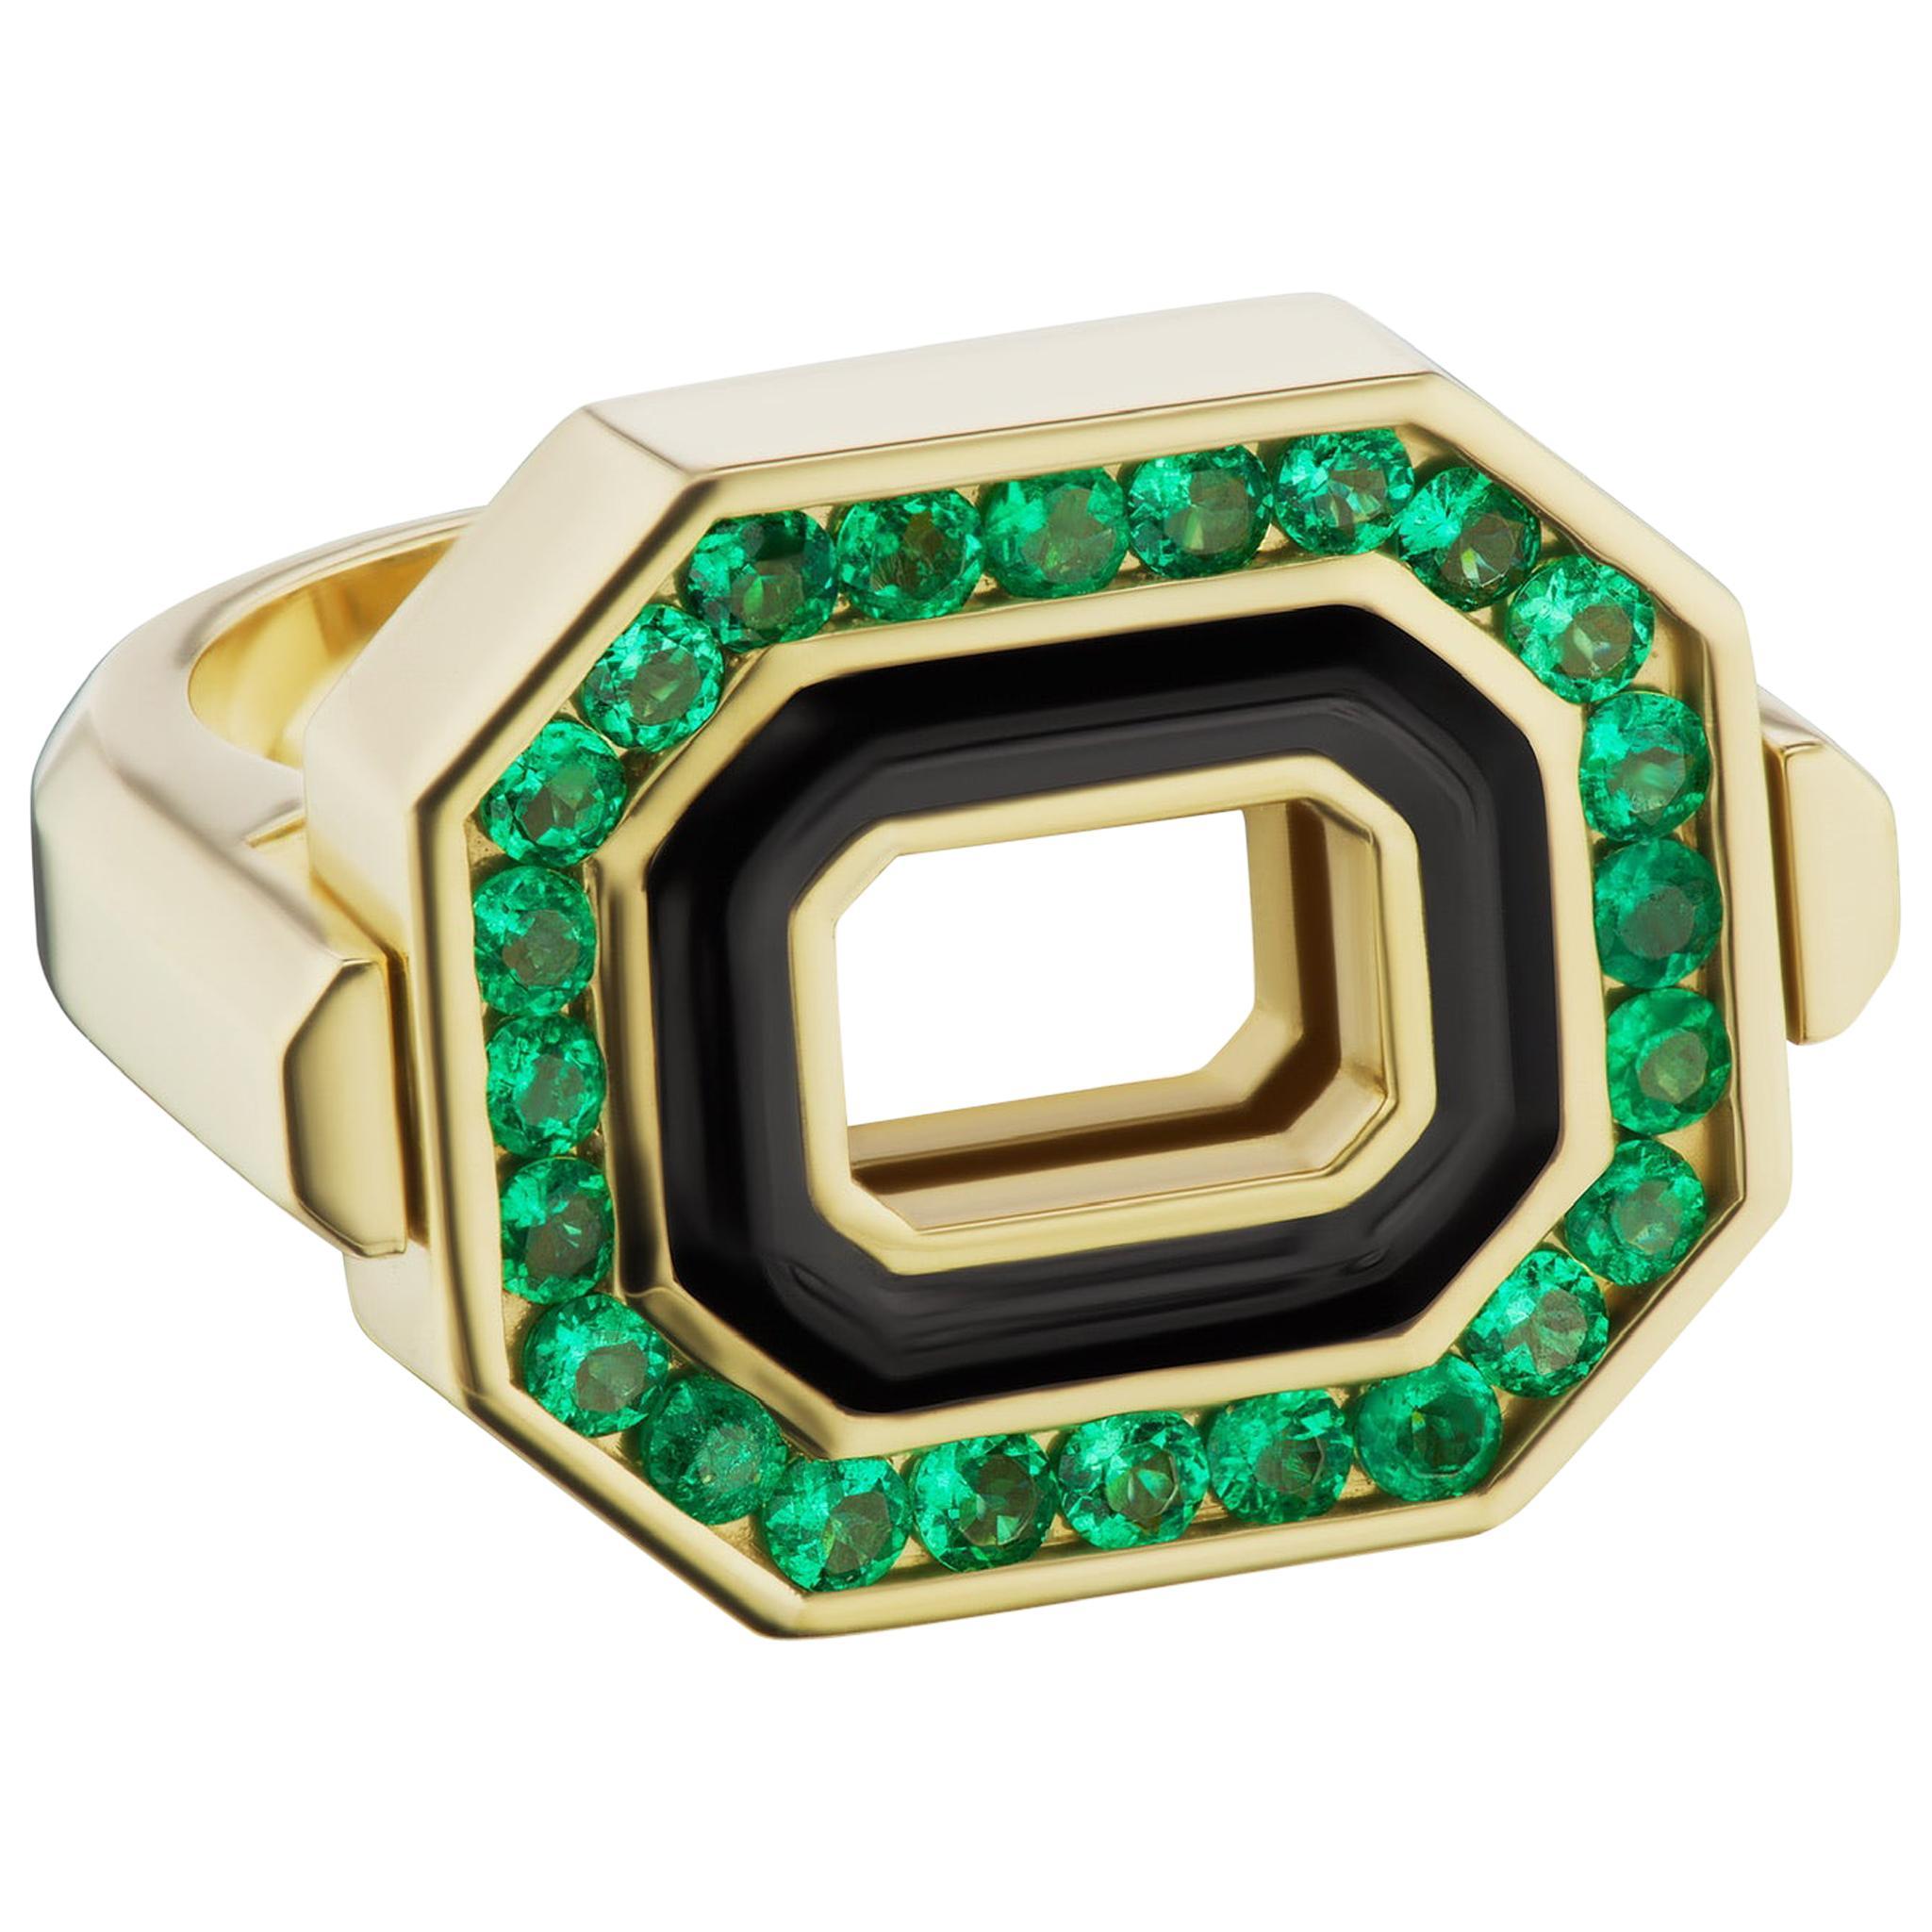 Flip Top Diamond, Emerald and Enamel Ring in 18 Karat Yellow Gold